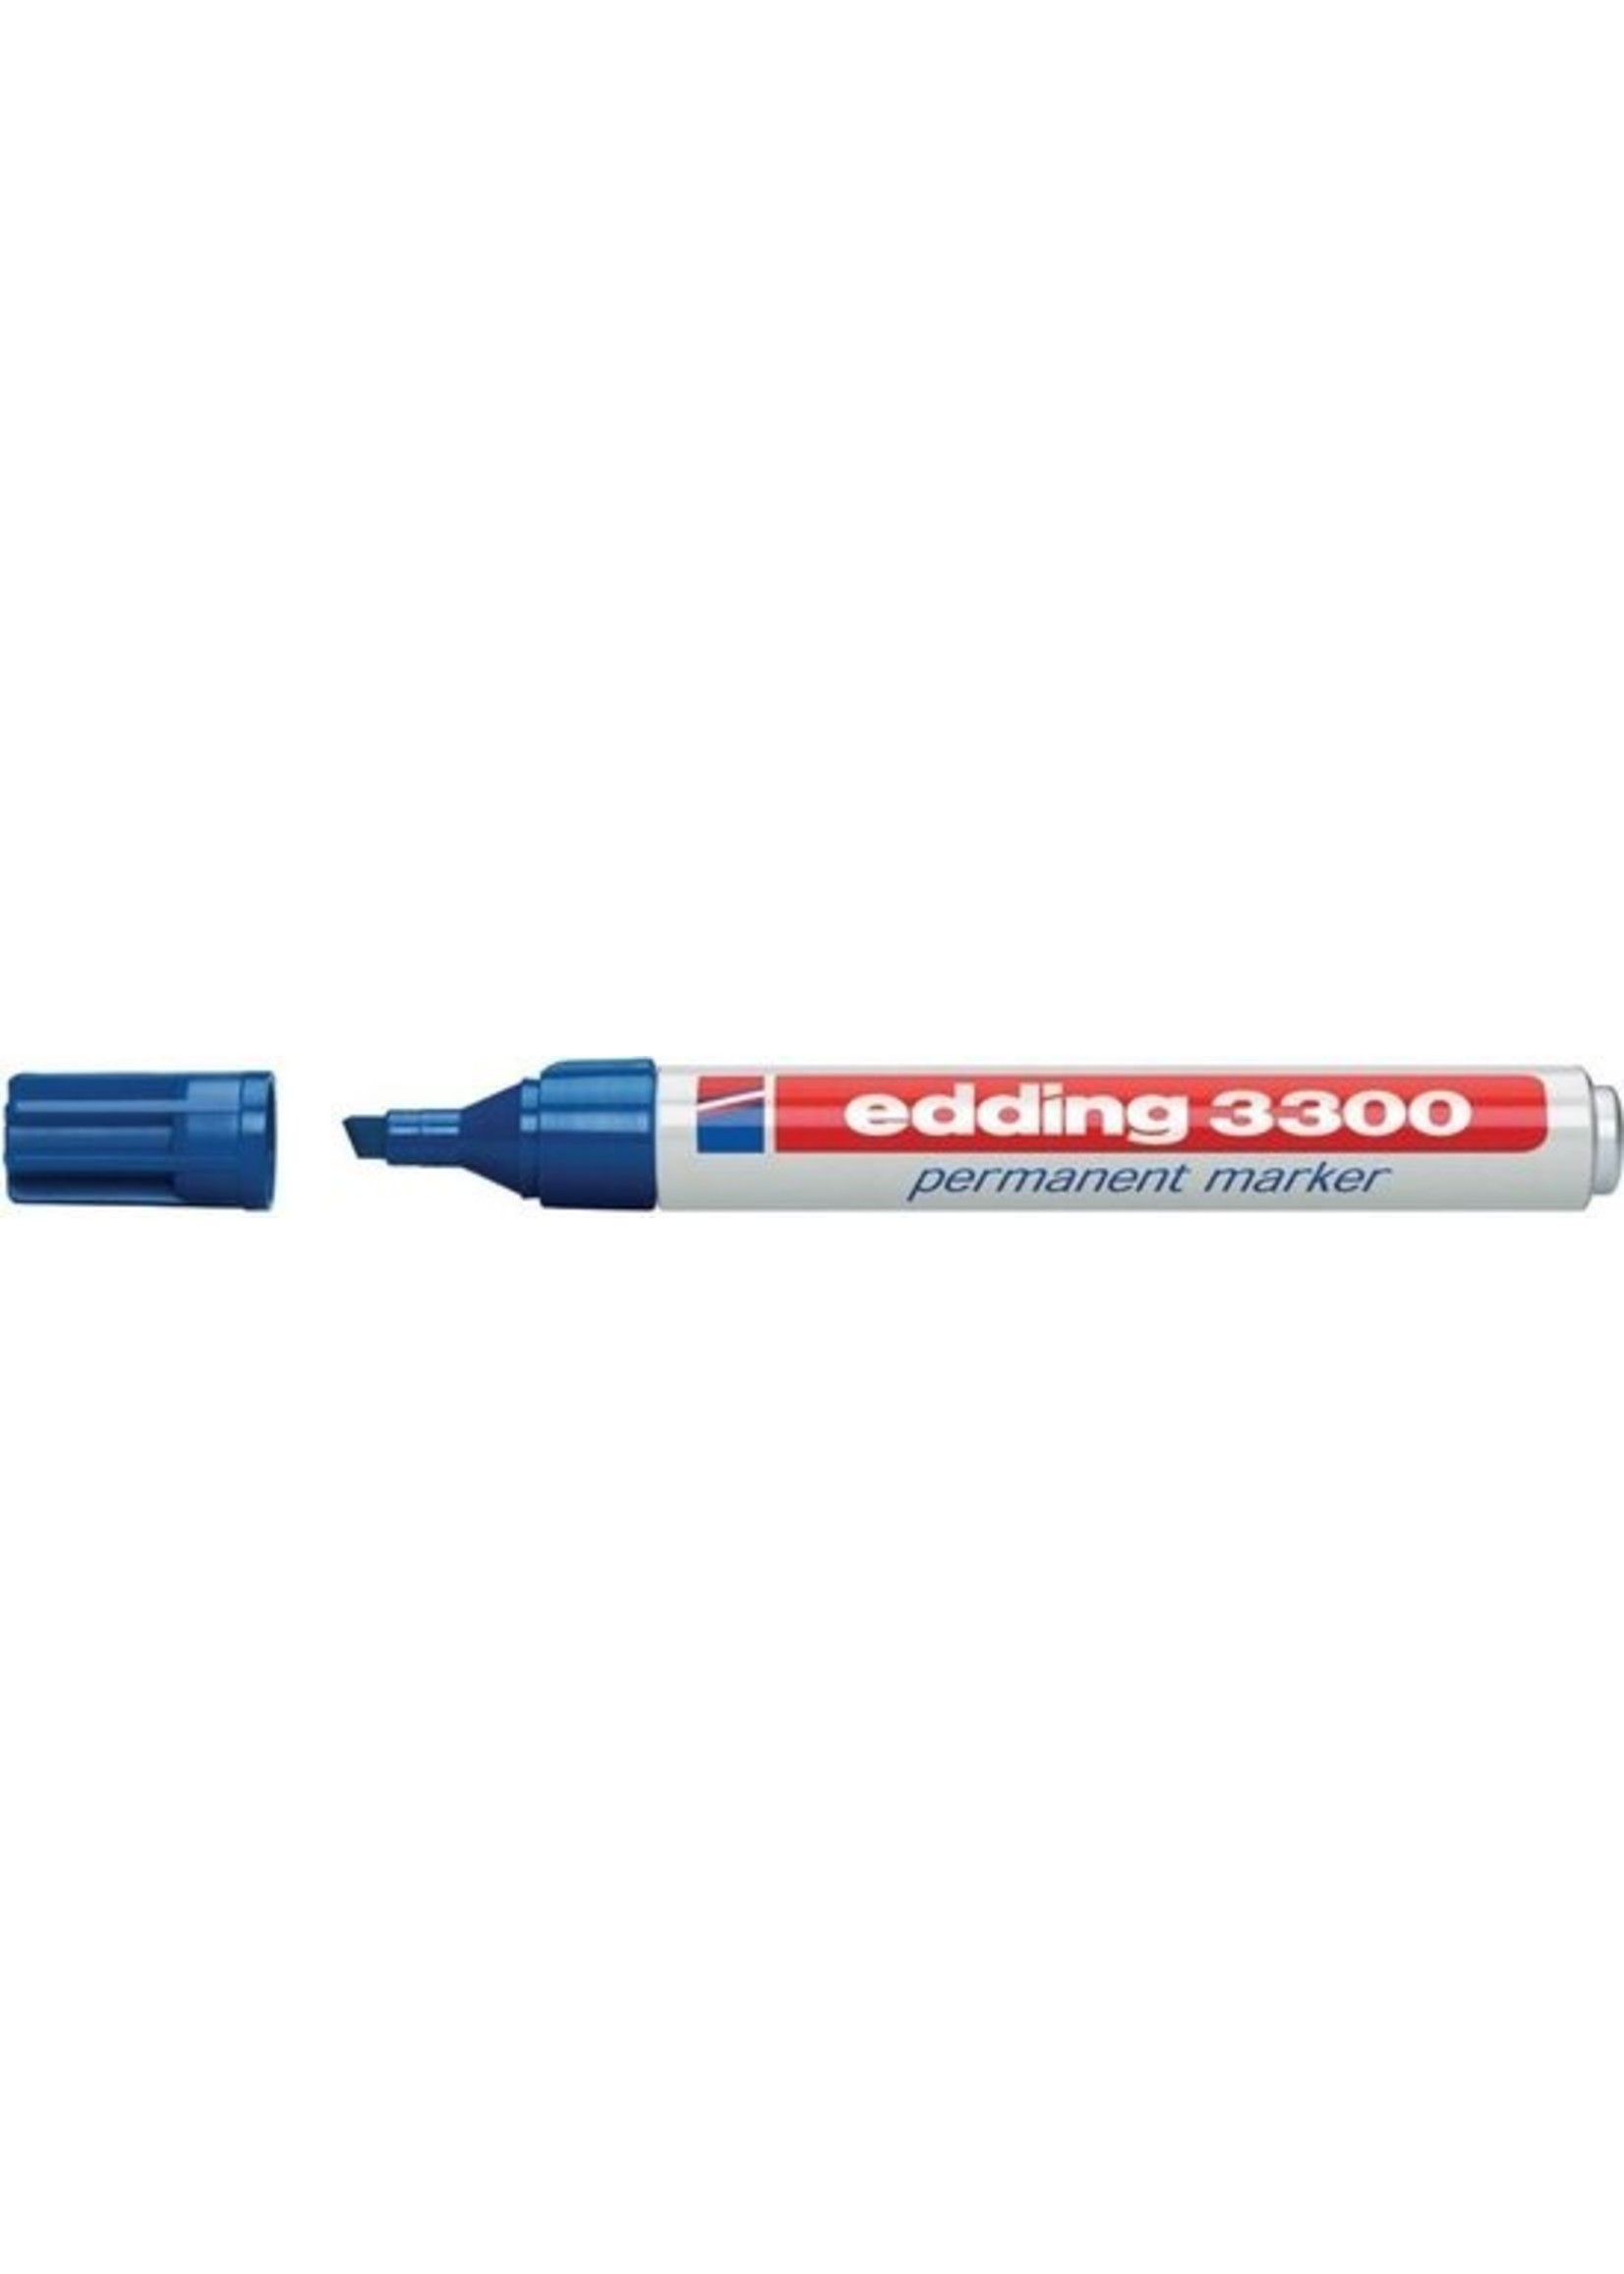 Edding Edding 3300 Permanent Marker Blauw